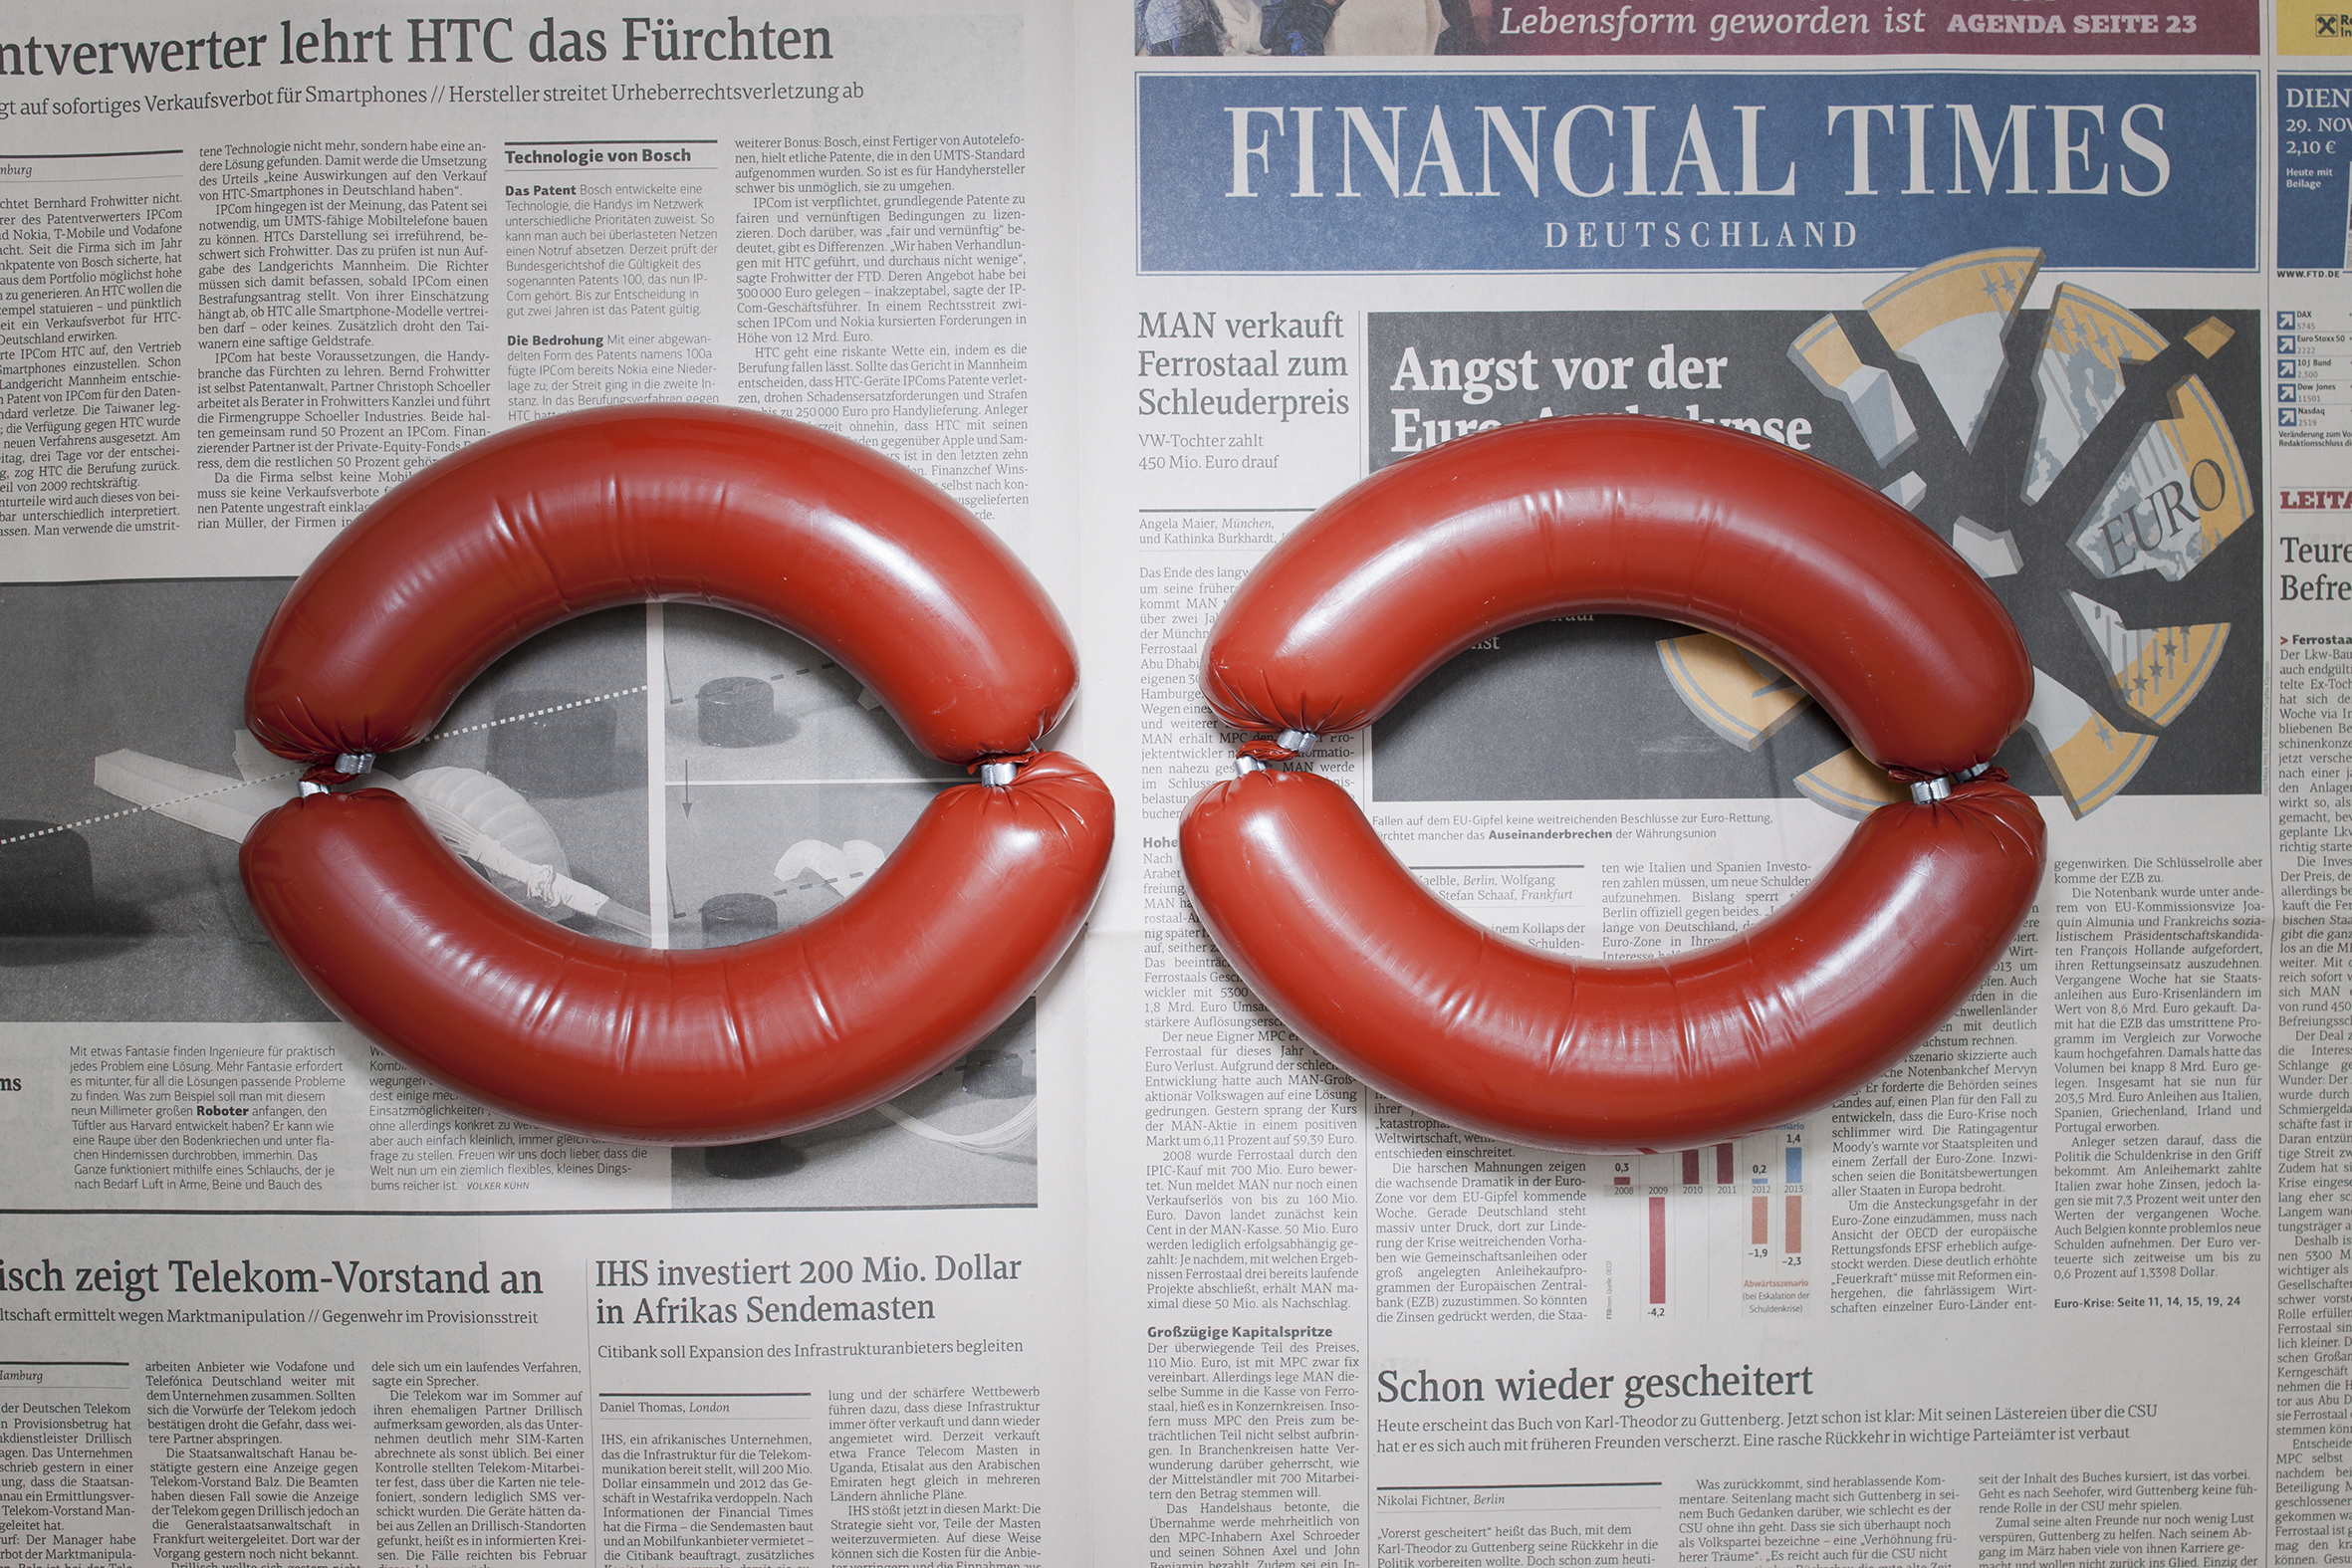 Stefen Chow & Lin Huiy, Γερμανία, Αμβούργο, Νοέμβριος 2011 4,82 ευρώ, από τη σειρά The Poverty Line